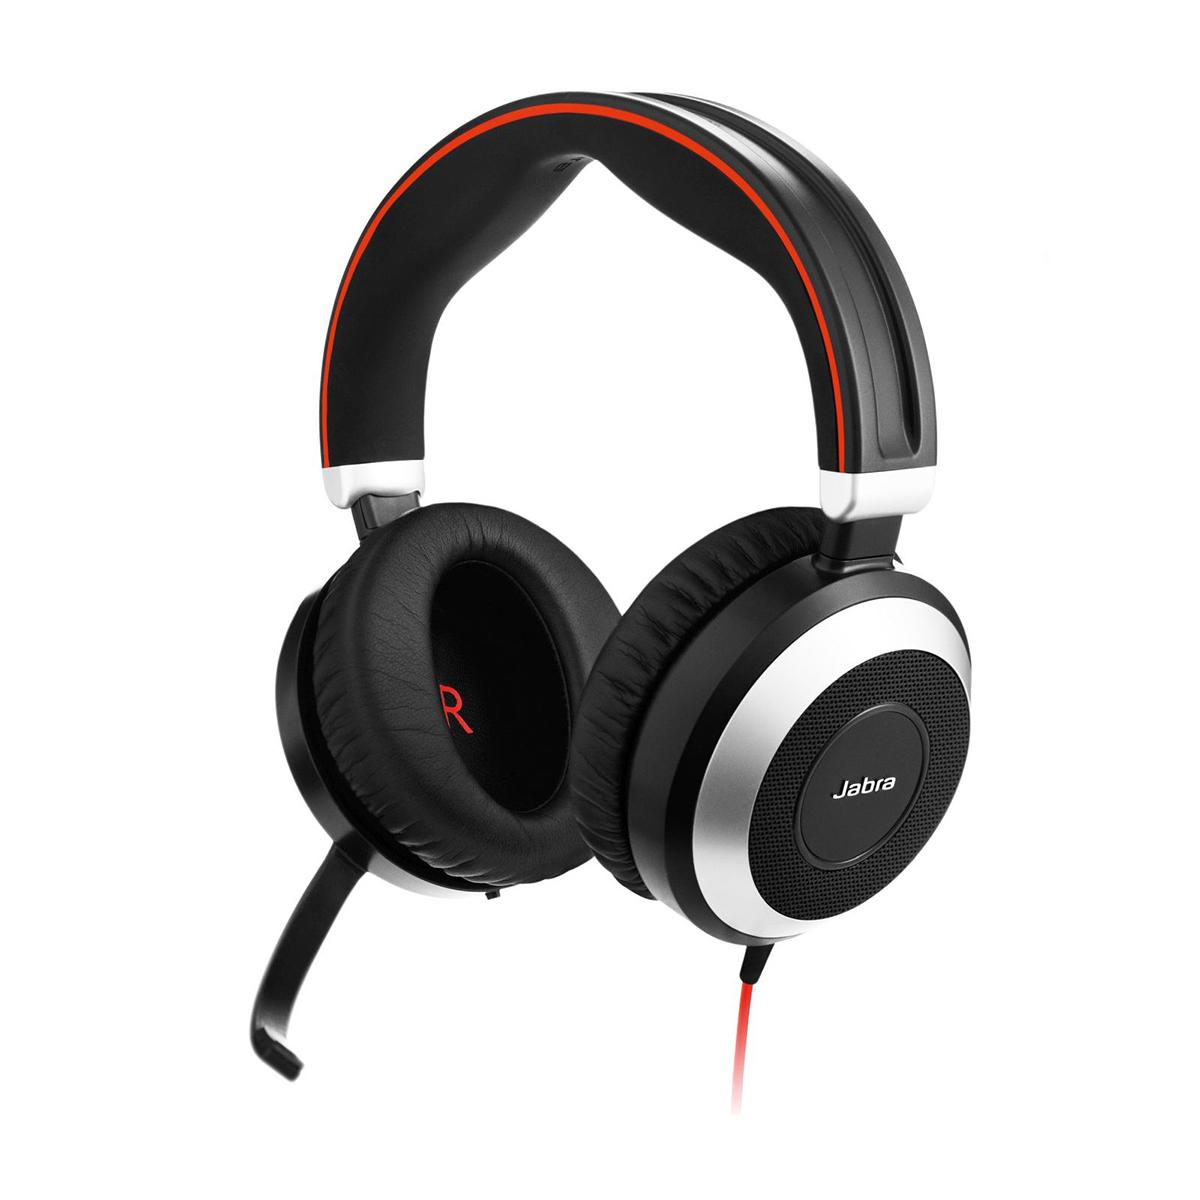 Jabra Evolve 80 MS Stereo NC Headset